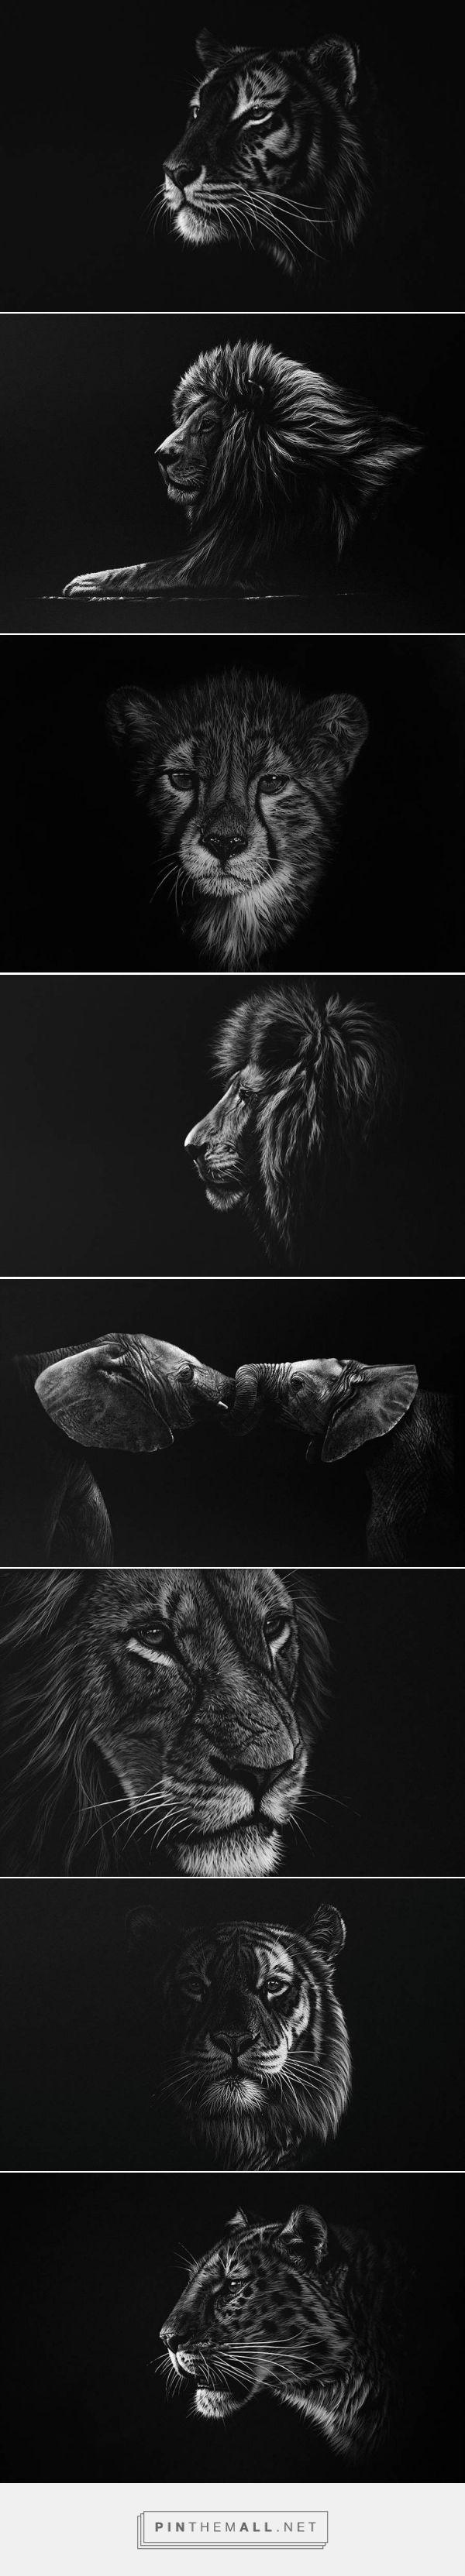 Richard Symonds :: Stunning Realistic Wildlife White on Black Drawings